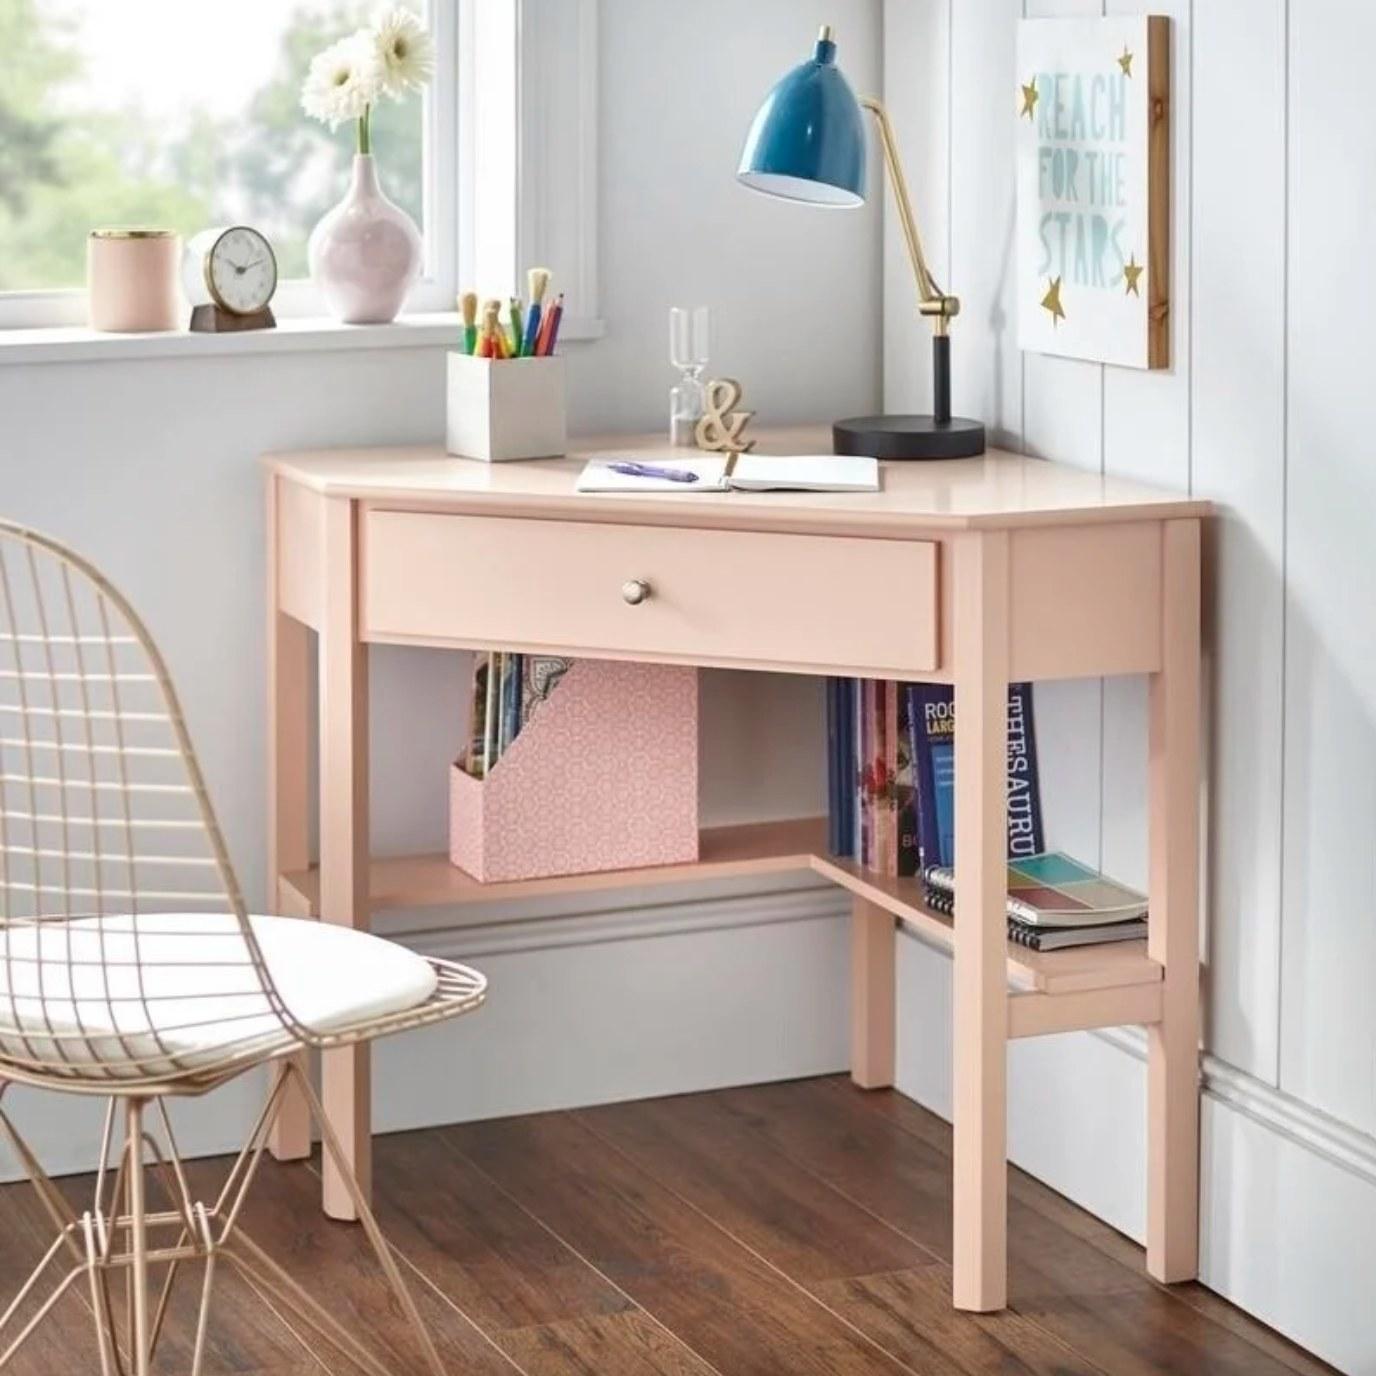 The corner desk in blush pink